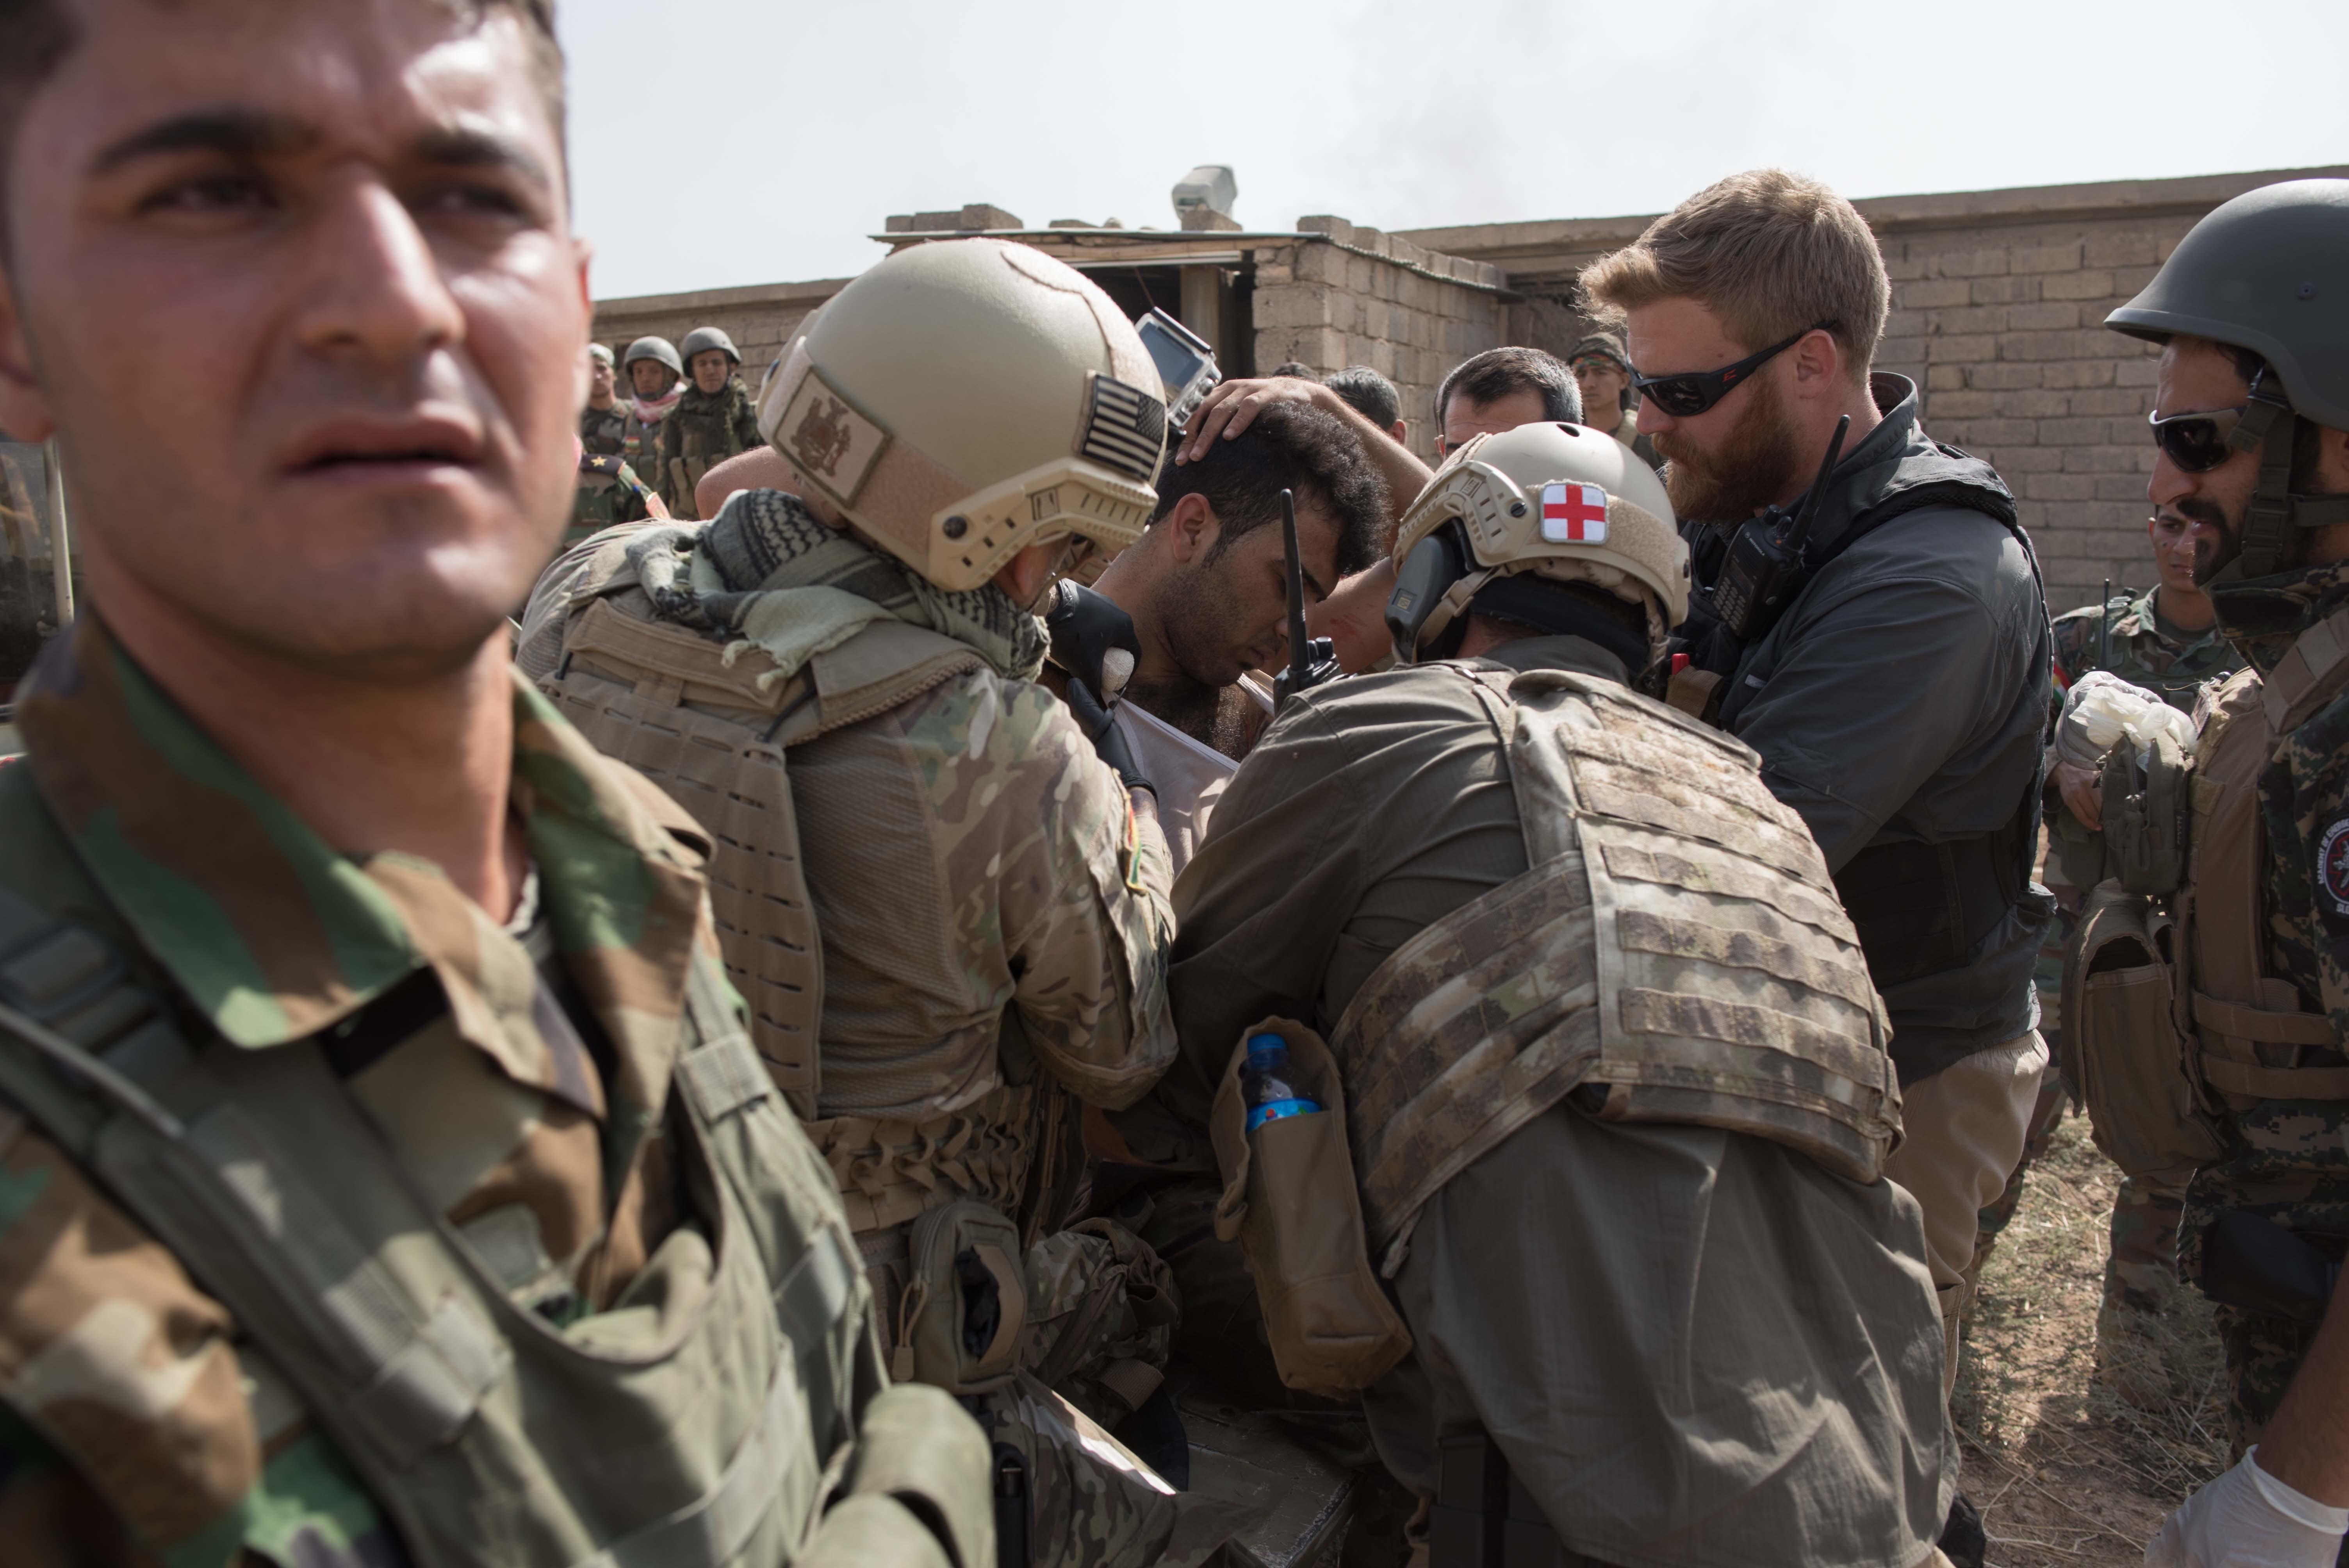 American volunteer medics treating a wounded Kurdish fighter in Shahkoli on Monday 17 October 2016